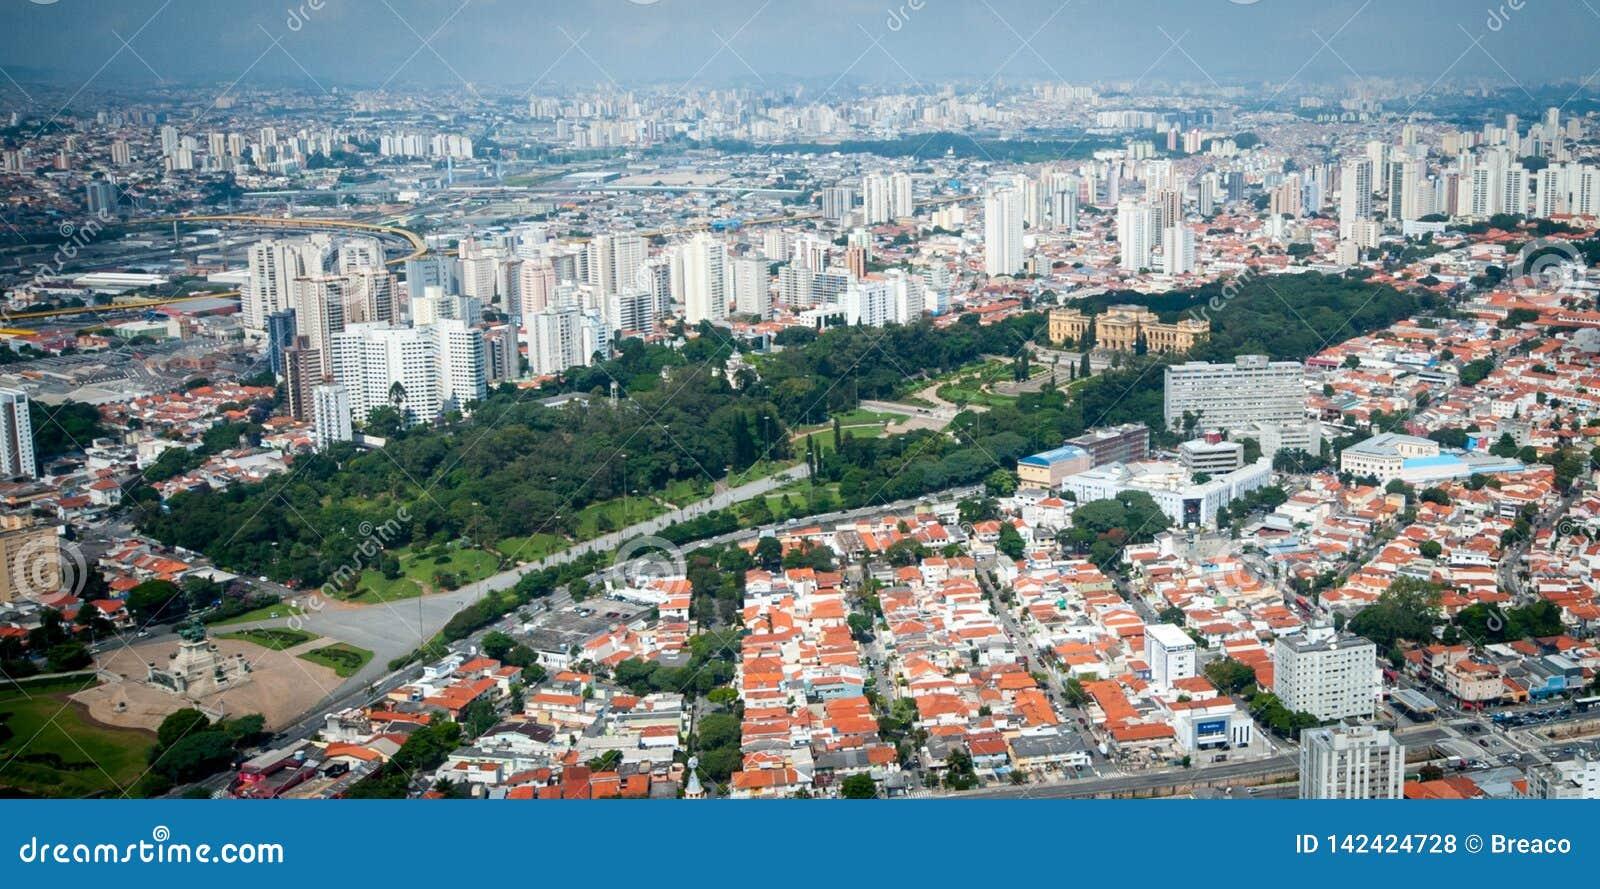 Overflight i São Paulo Brazil helicopterIpirangamuseum